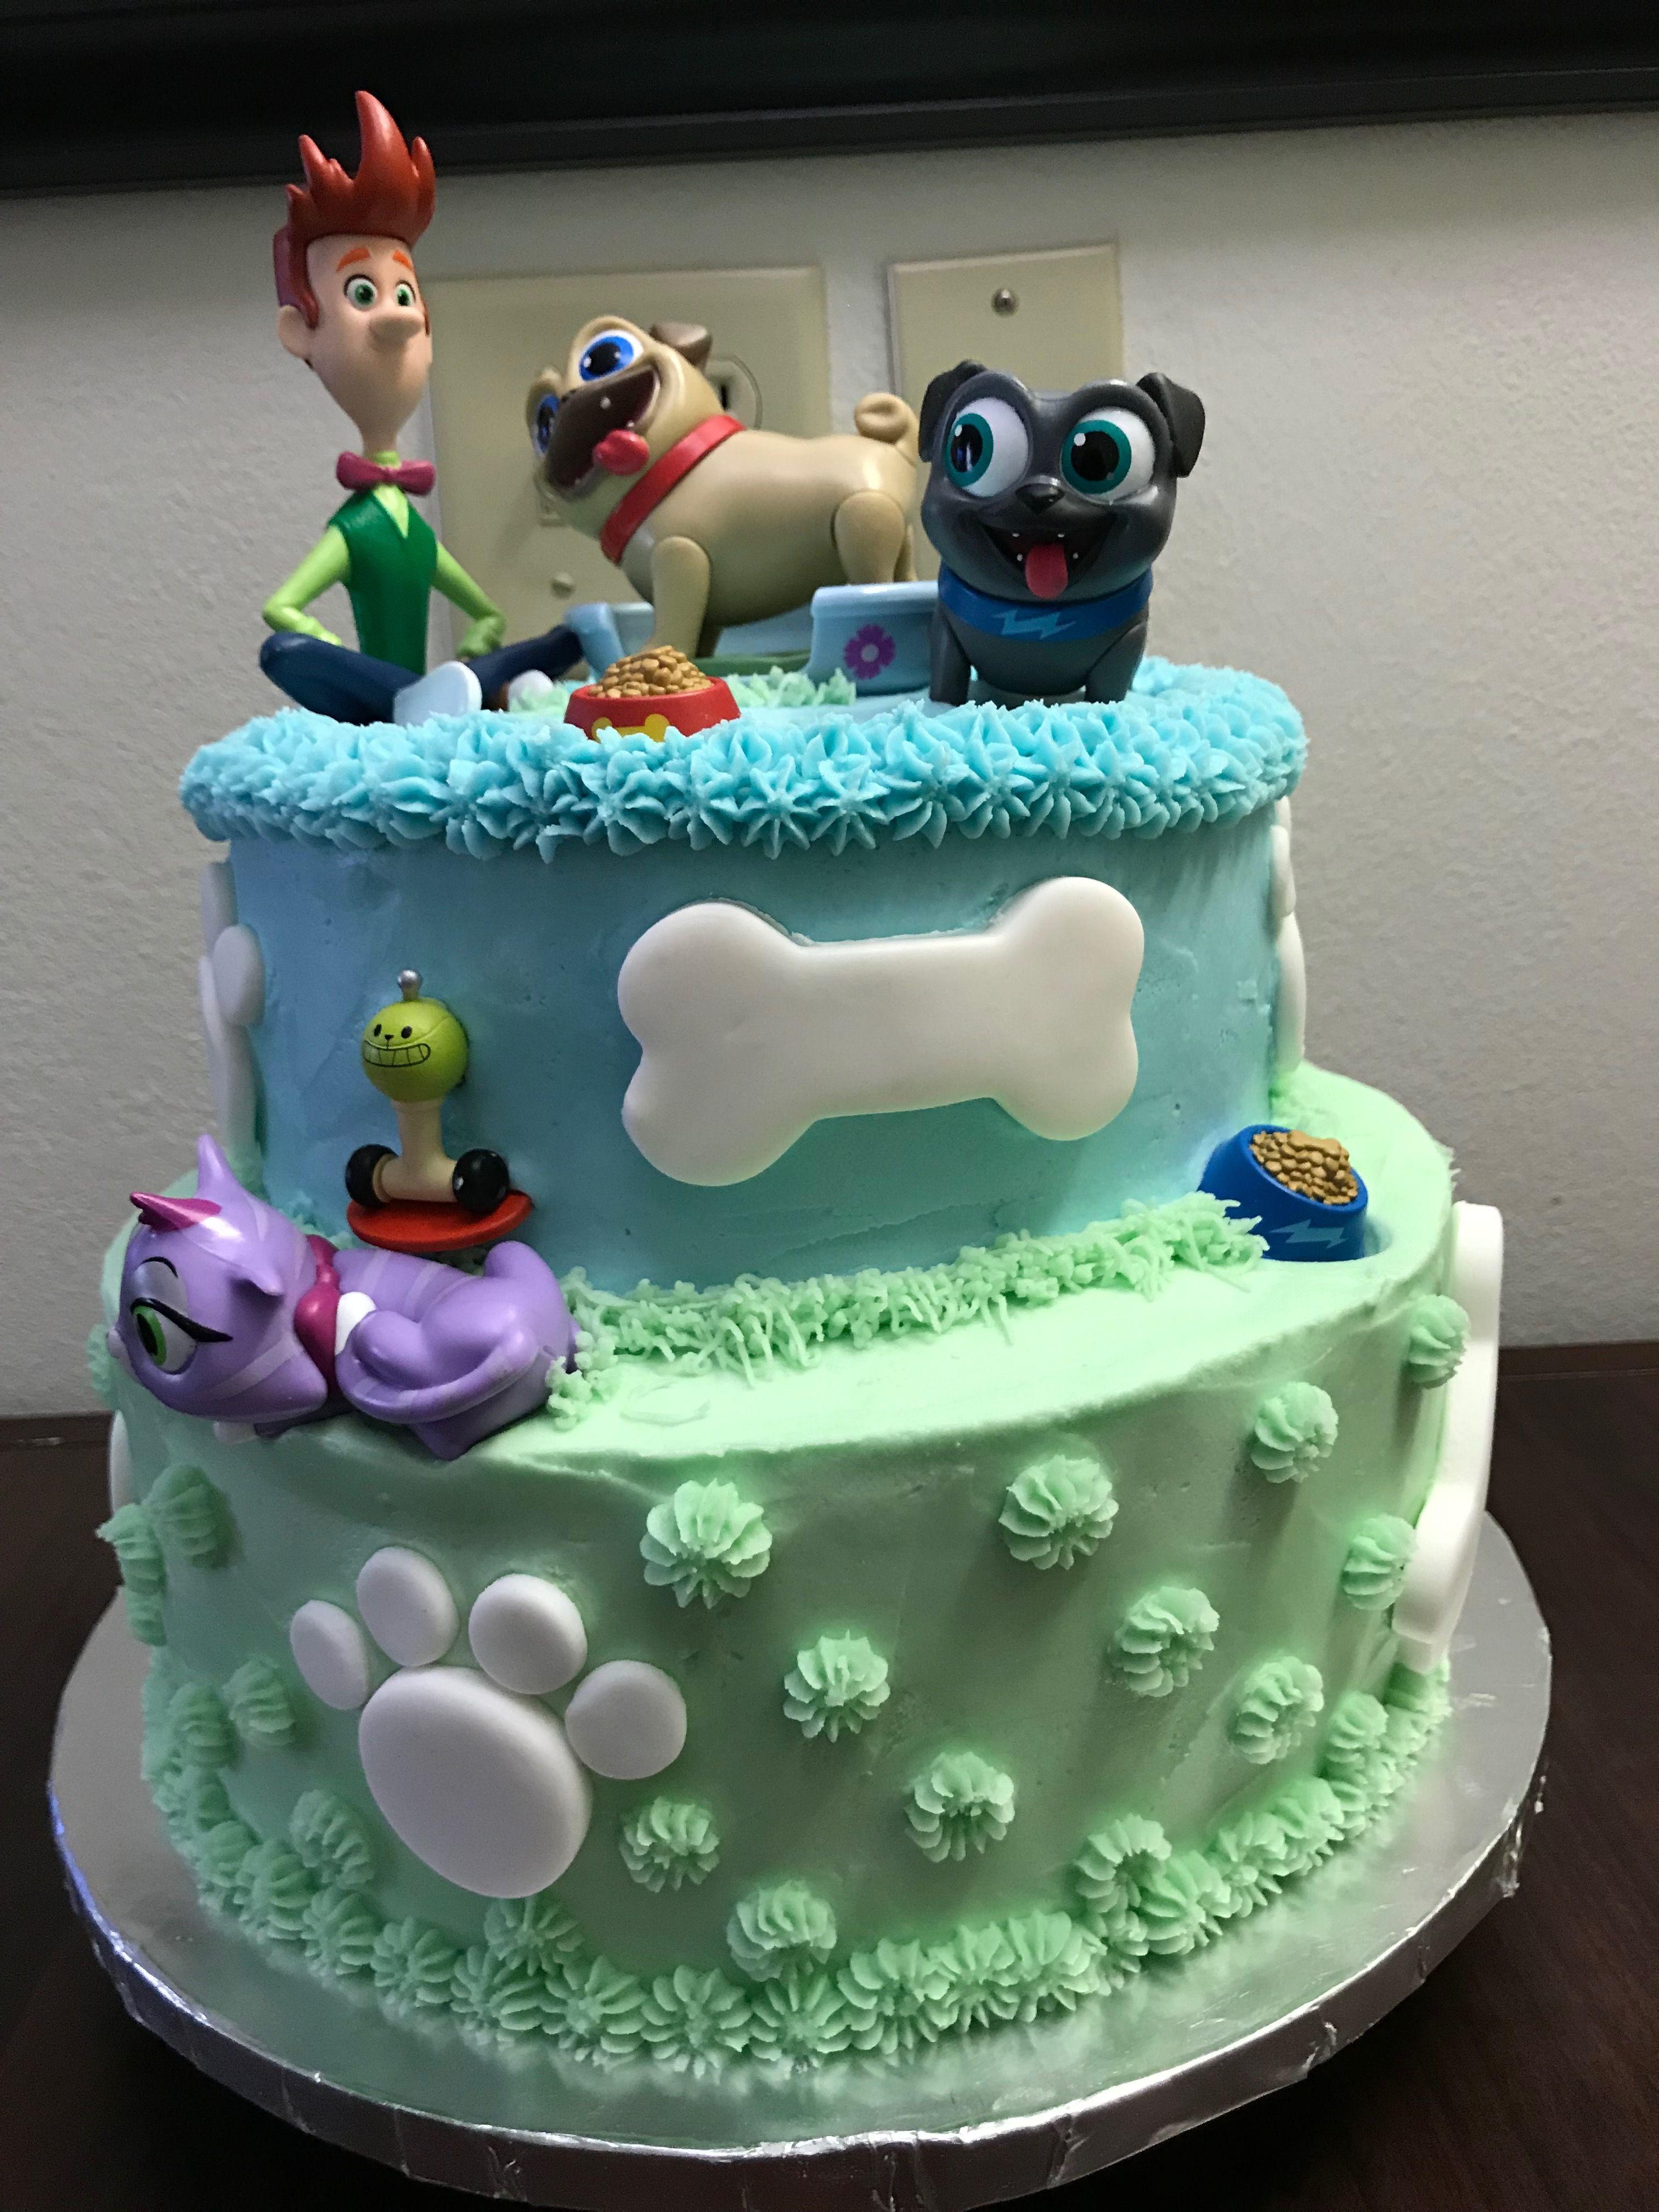 Disney Junior Puppy Dog Pals Bob Figure Figurine Birthday Cake Topper